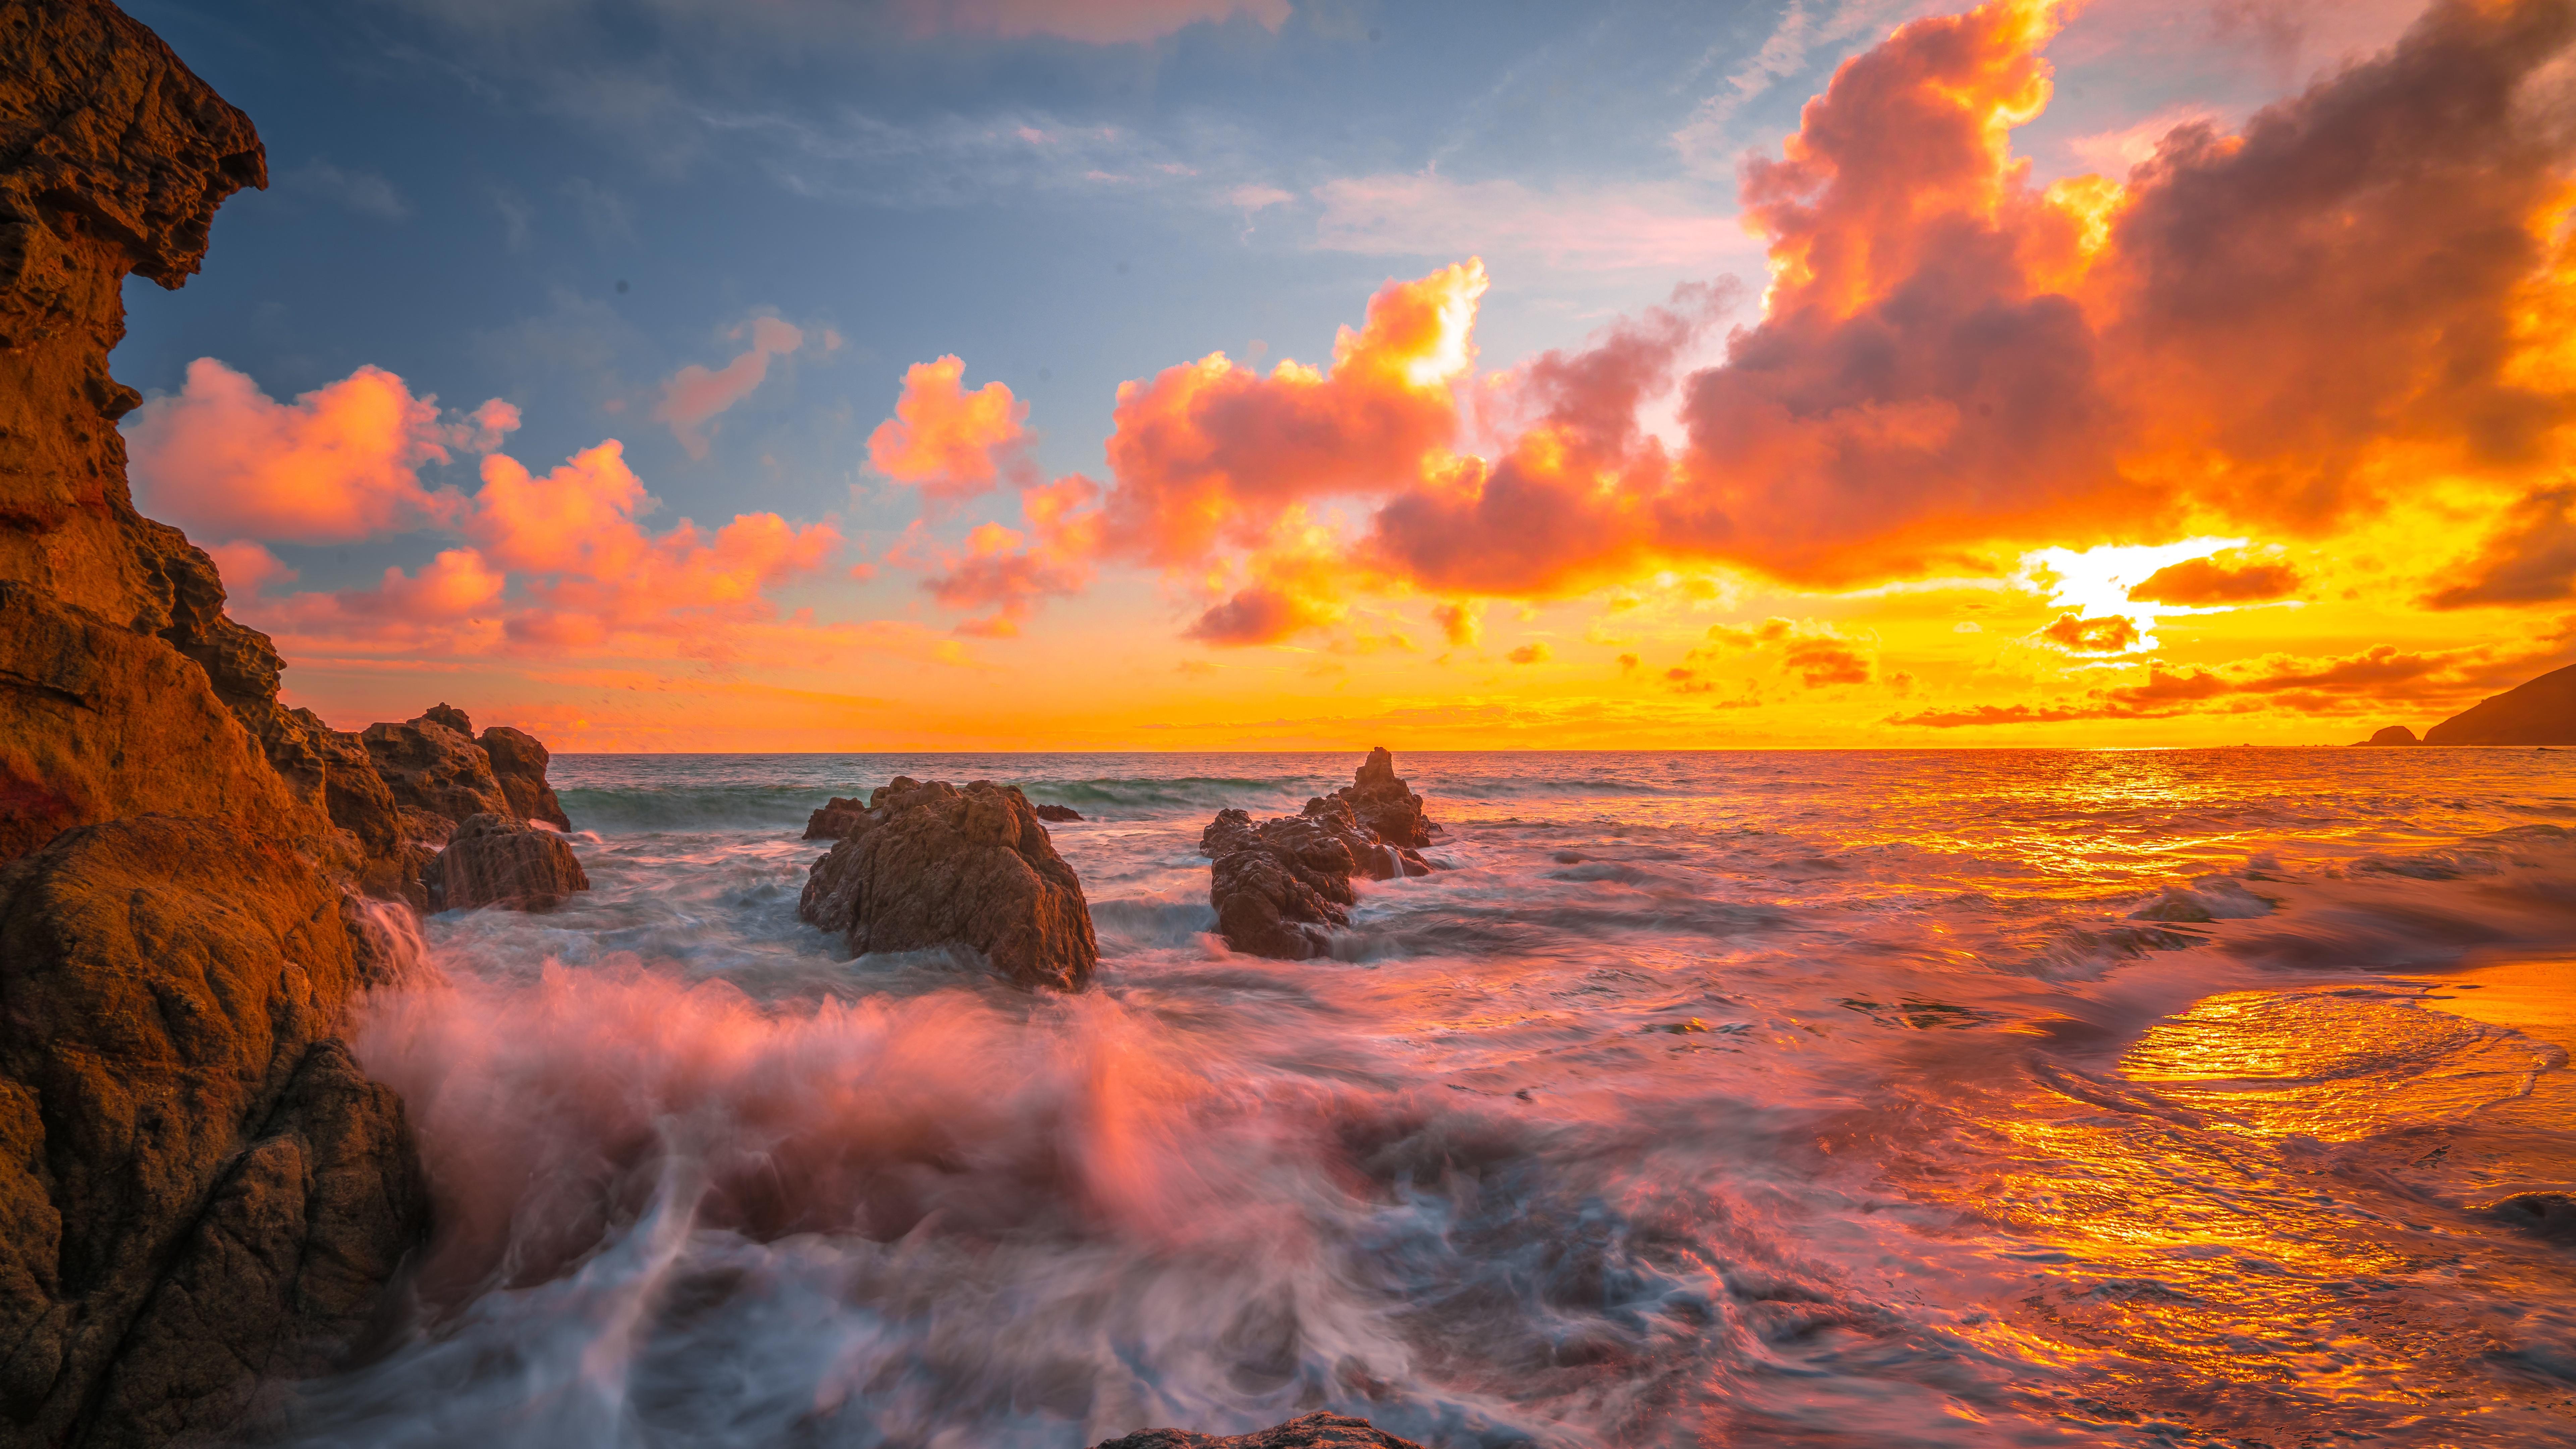 Ocean Sunset 8k 8k HD 4k Wallpapers